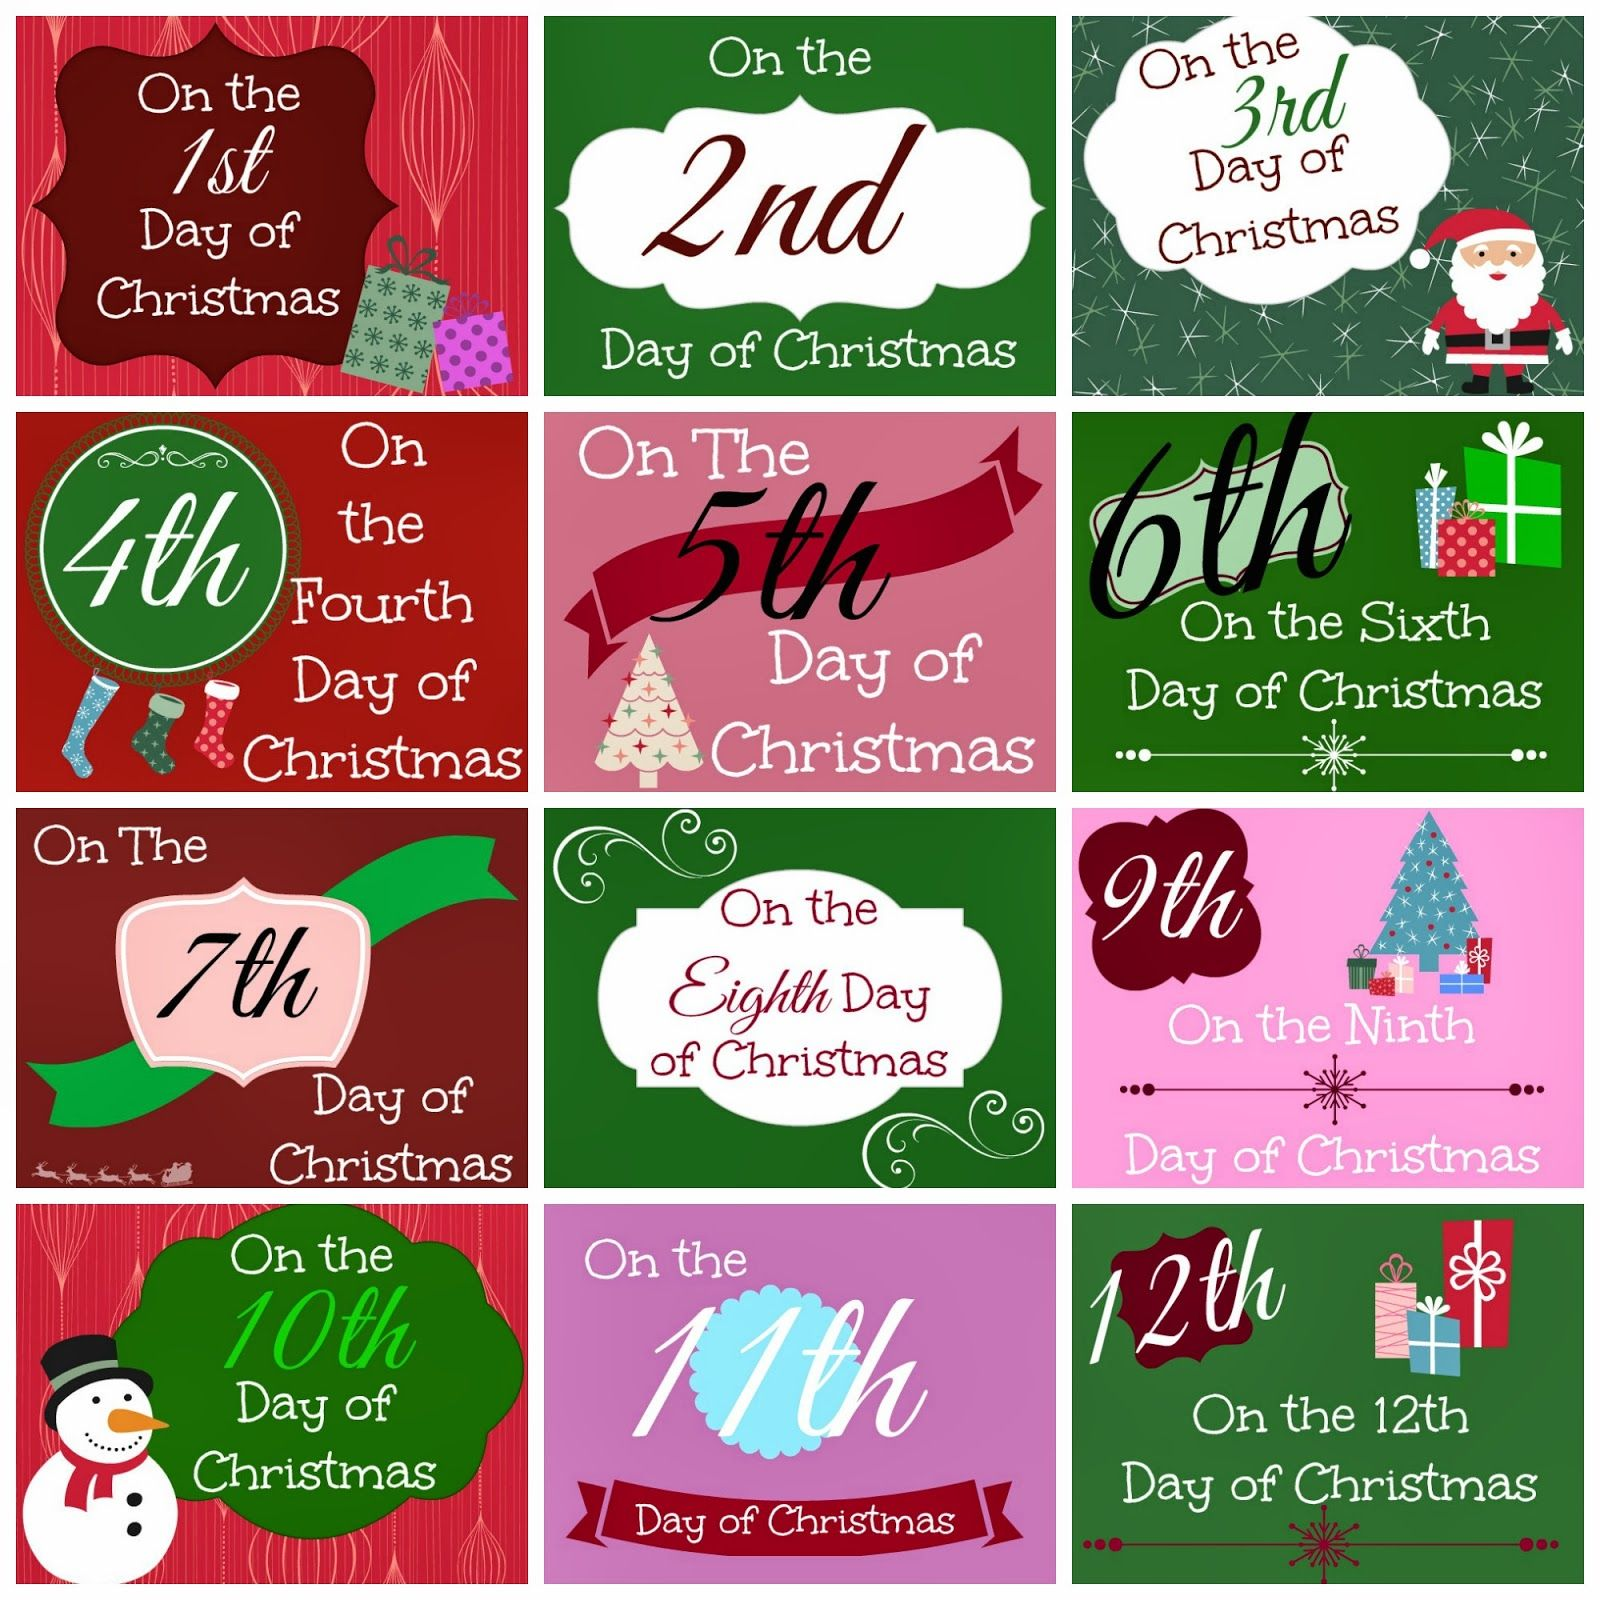 12 Days Of Christmas Printable Tags Busy Moms Helper Christmas Tags Printable 12 Days Of Christmas 12 Days Of Xmas